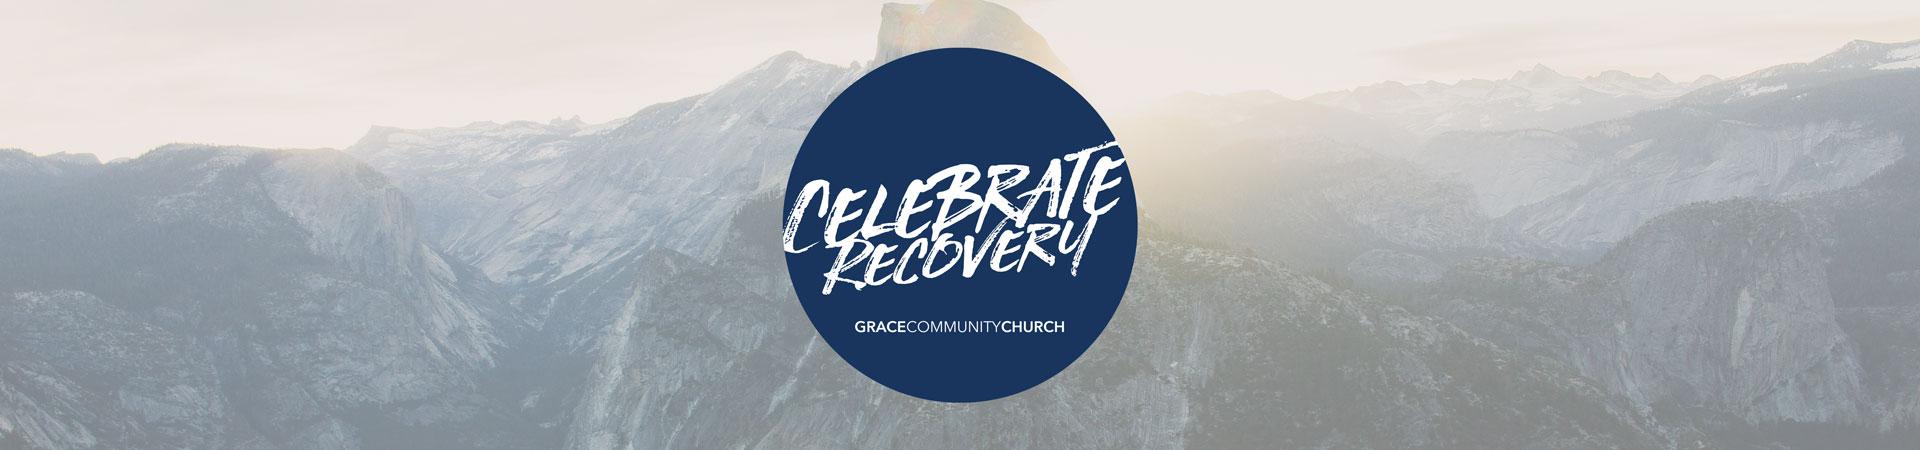 Celebrate Recovery - Chris Centered 12 Step Program - Grace Community Church